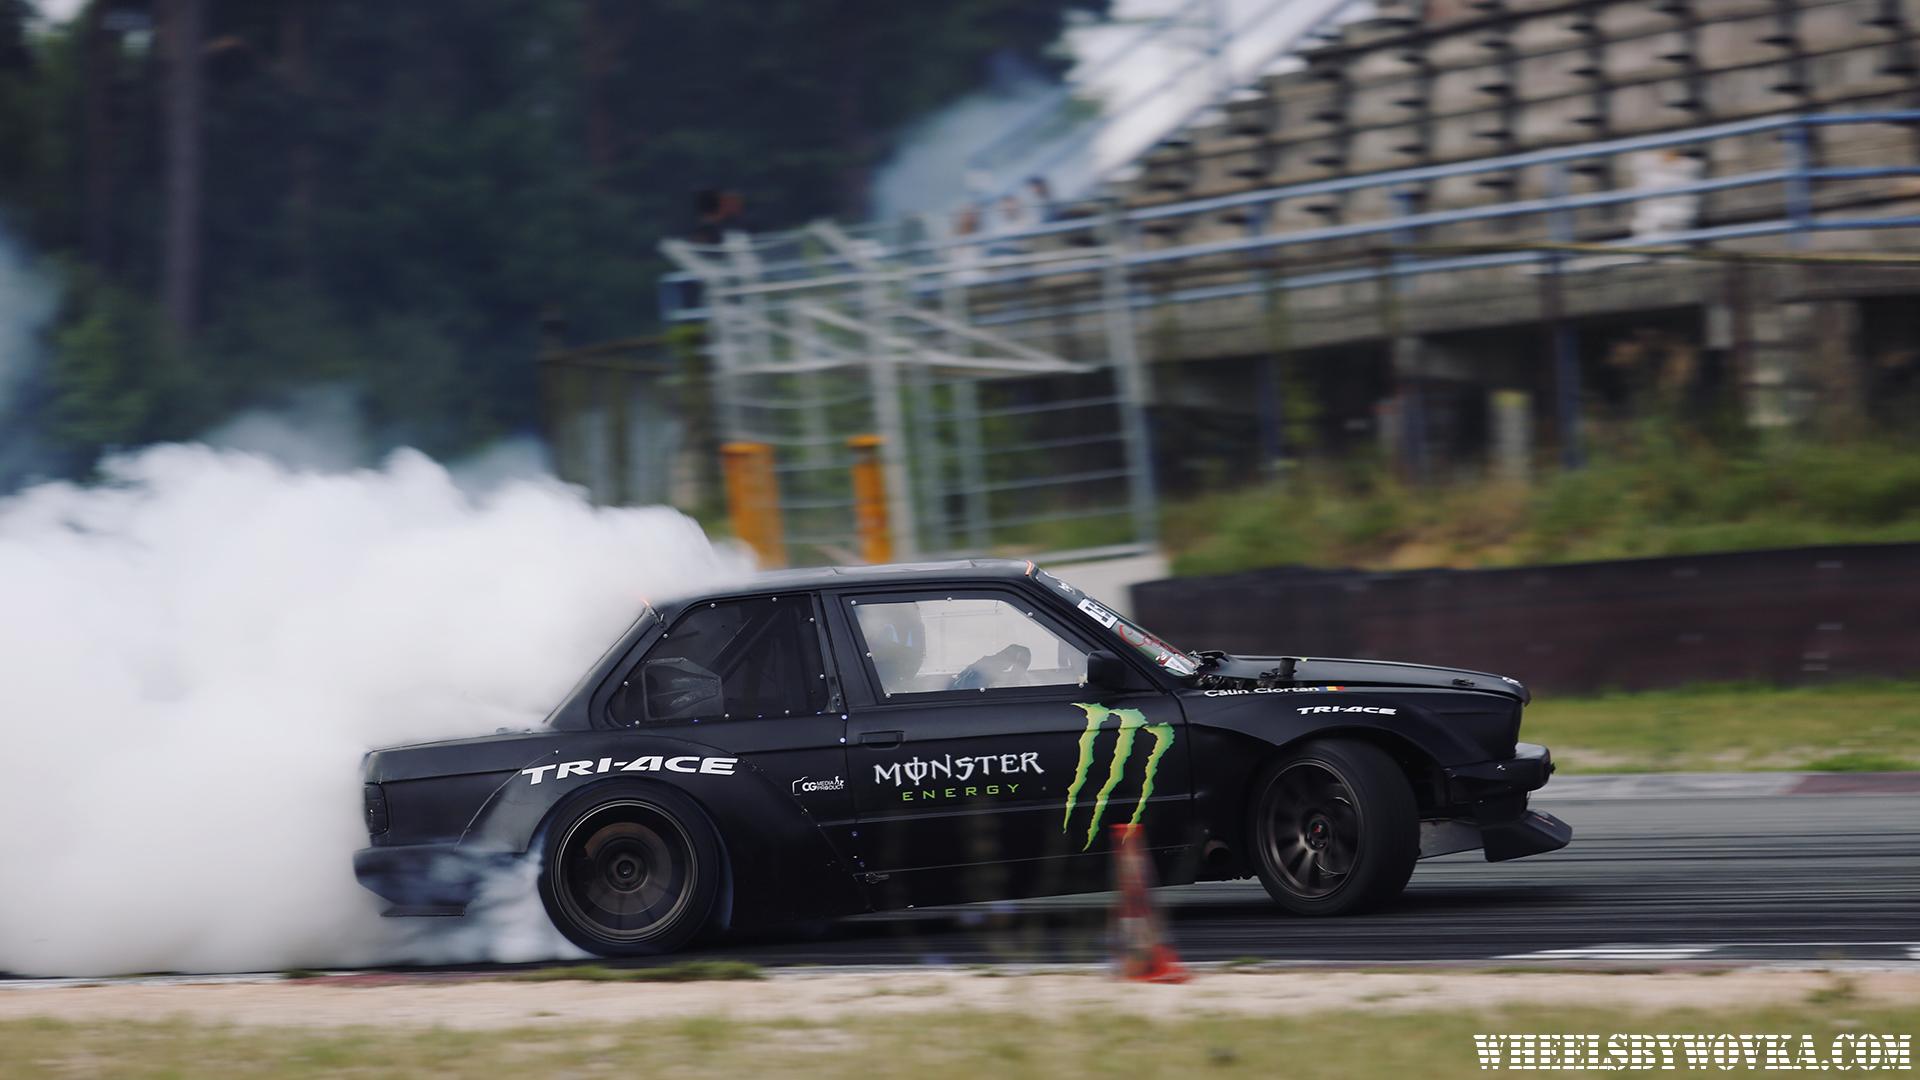 hgk-drift-challenge-2018-by-wheelsbywovka-22